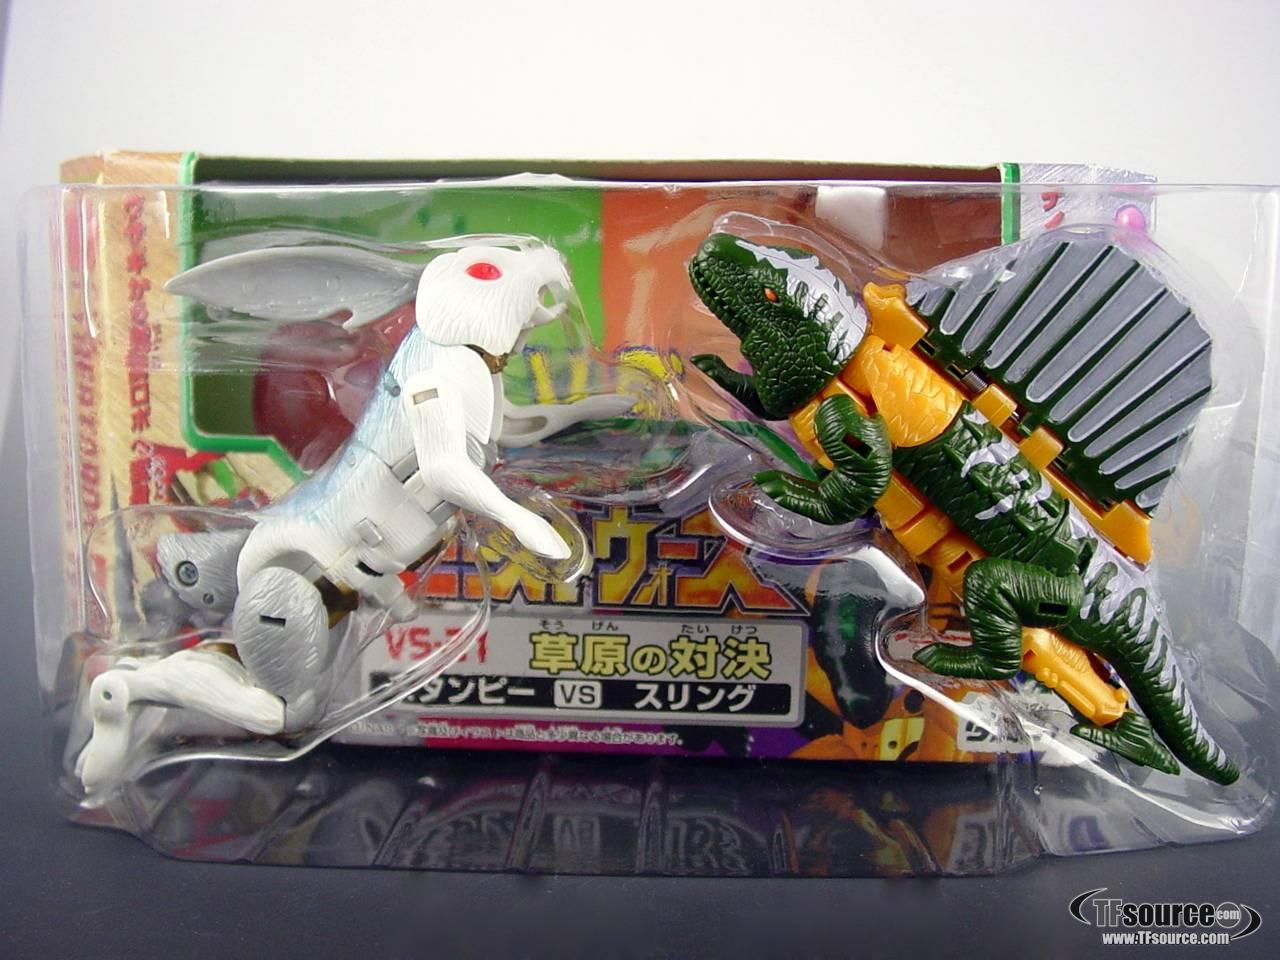 Beast Wars Neo - VS-31  Stampy VS Sling - MIB - 100% Complete